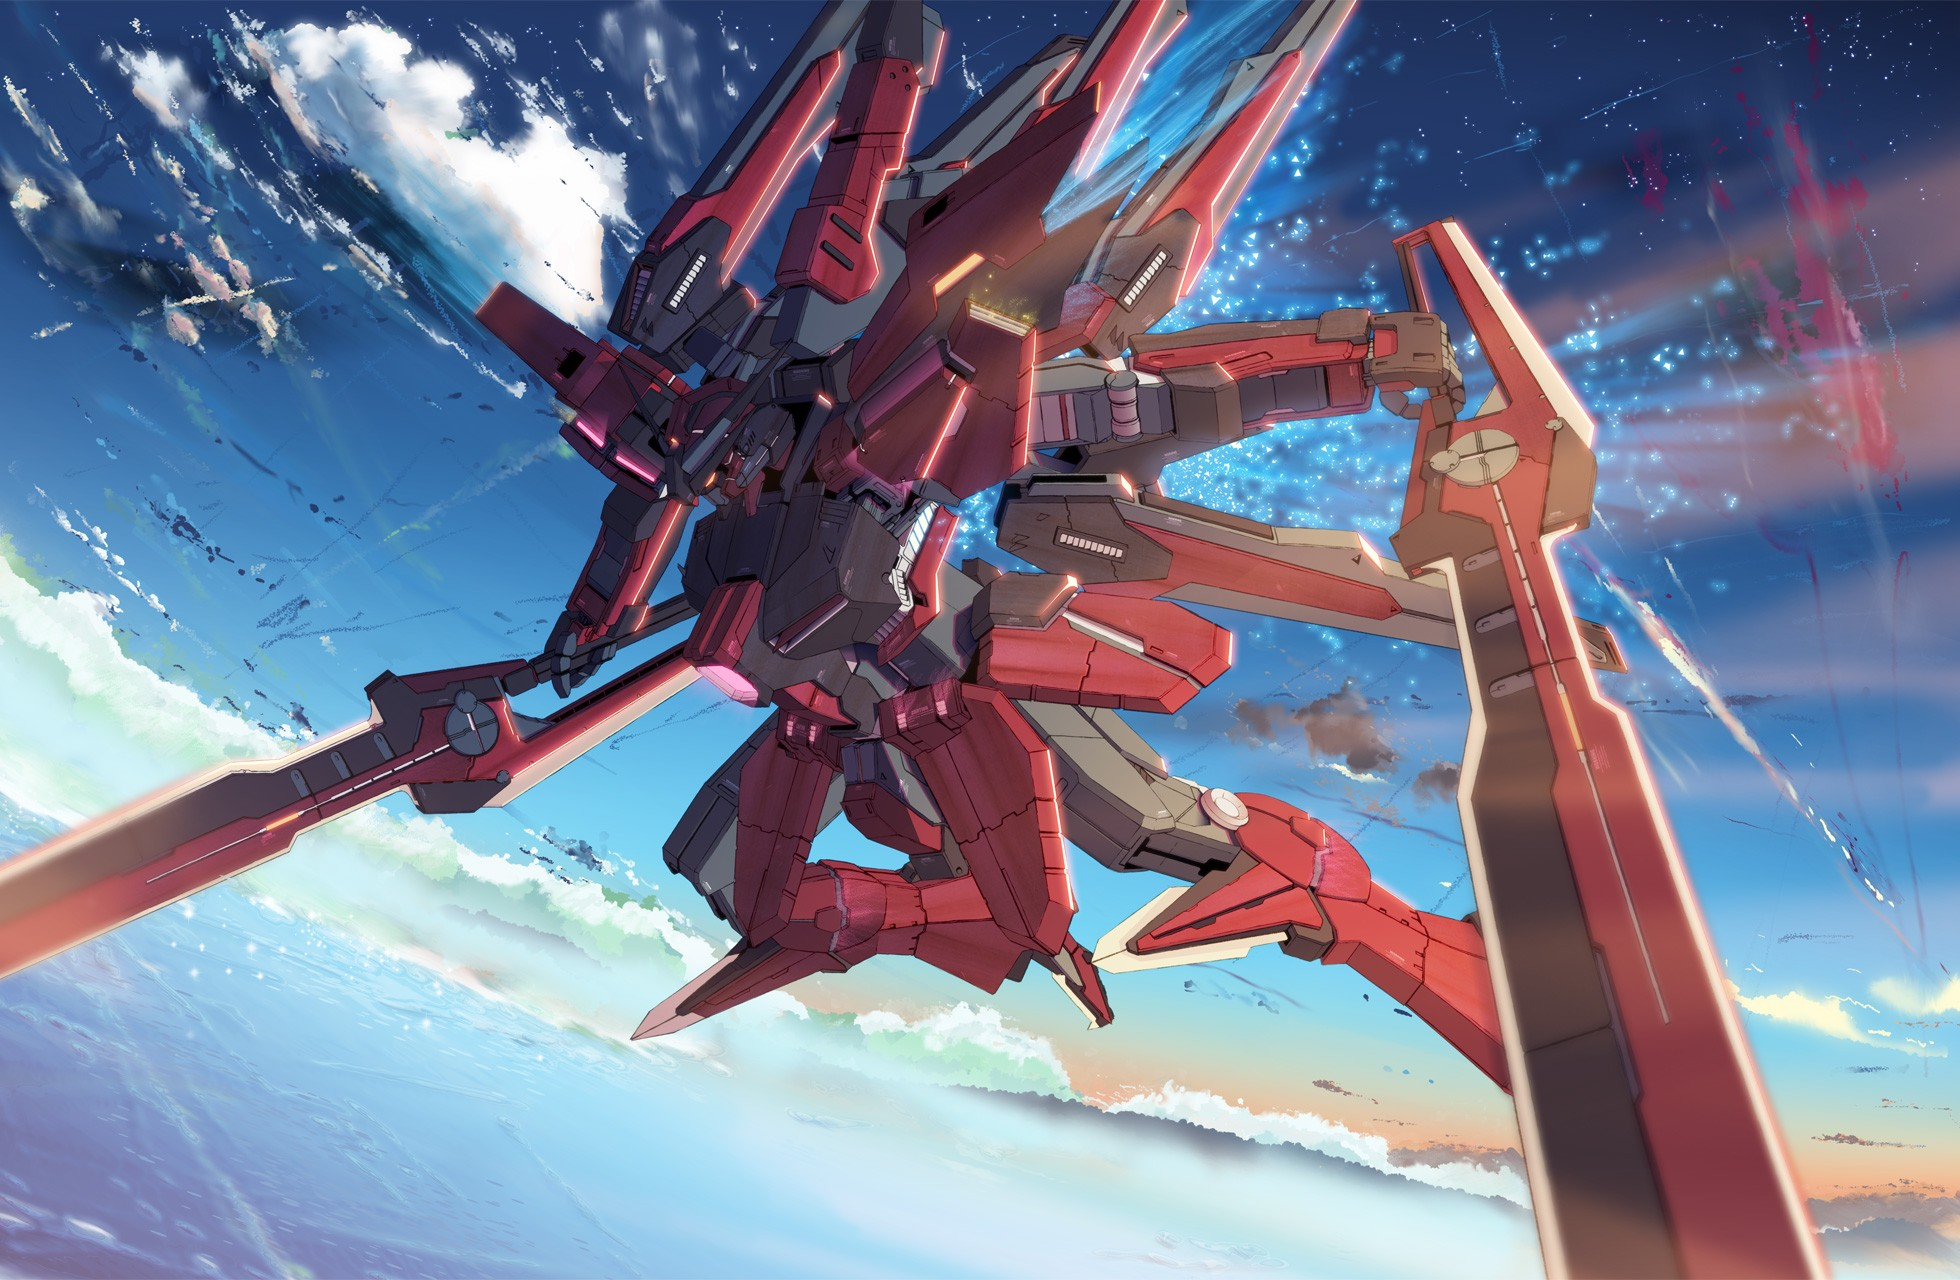 Mecha gundam wing anime skyscapes wallpaper   1960x1280